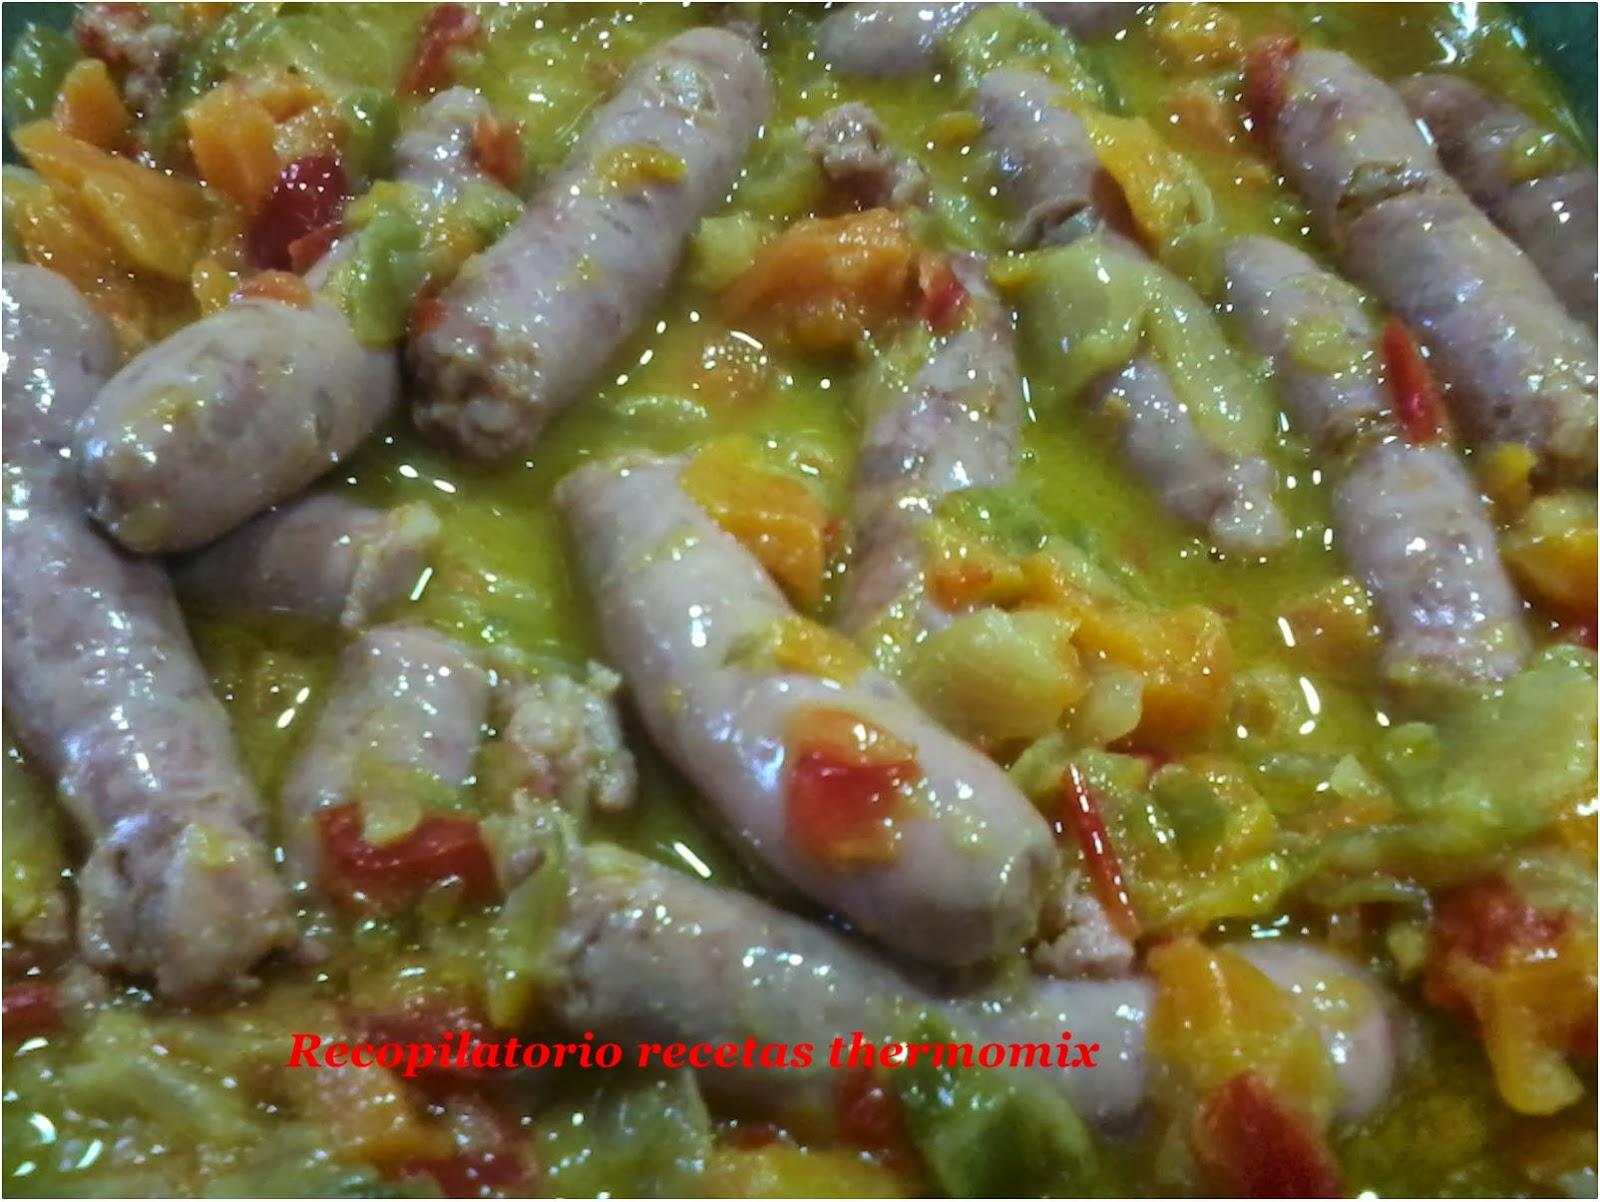 Recopilatorio de recetas thermomix salchichas frescas con - Salchichas frescas en salsa ...